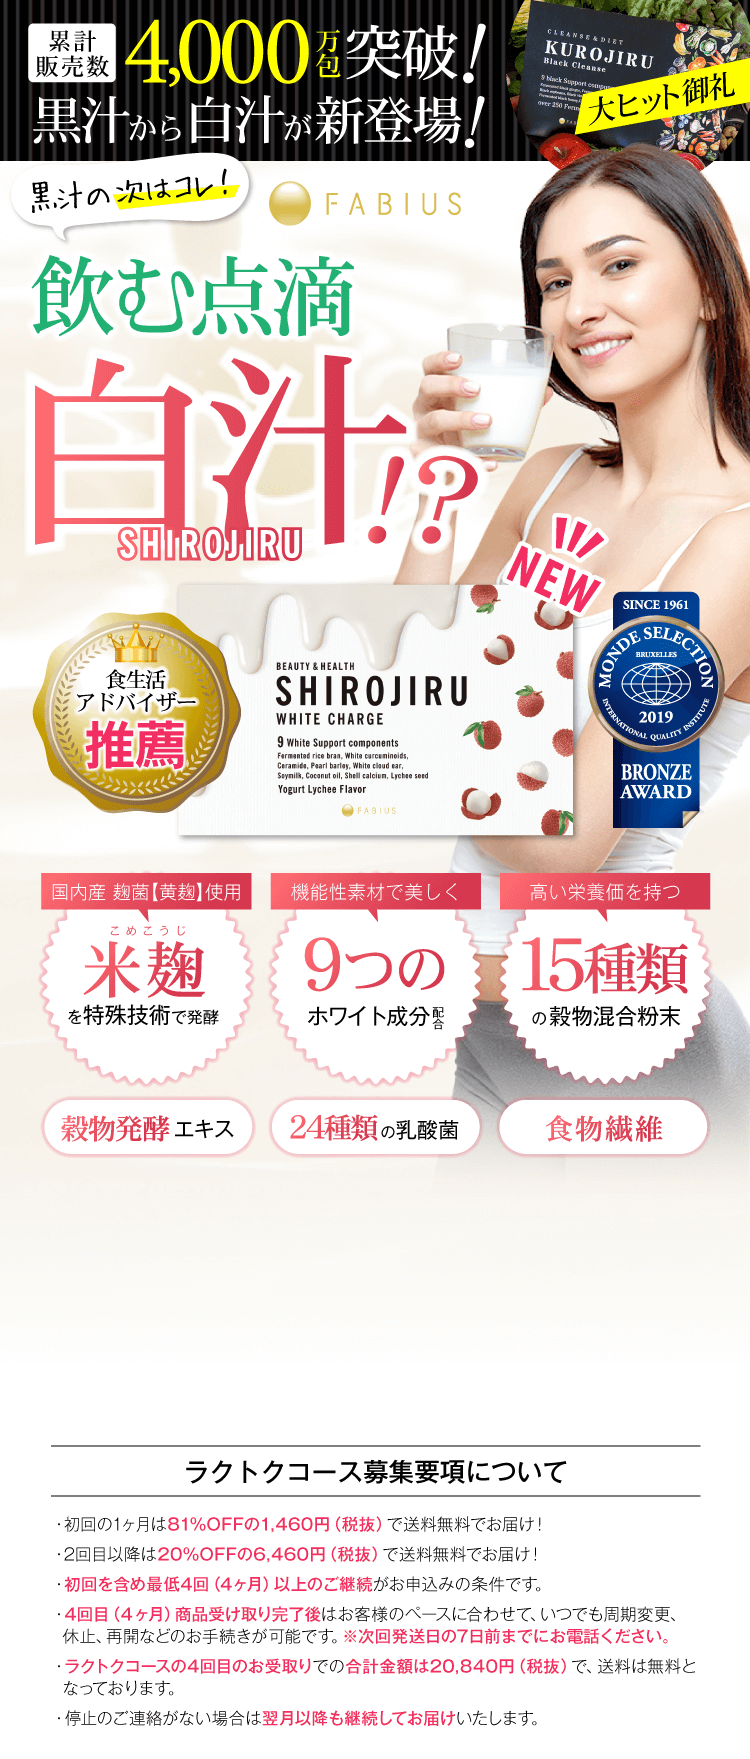 白汁 SHIROJIRU